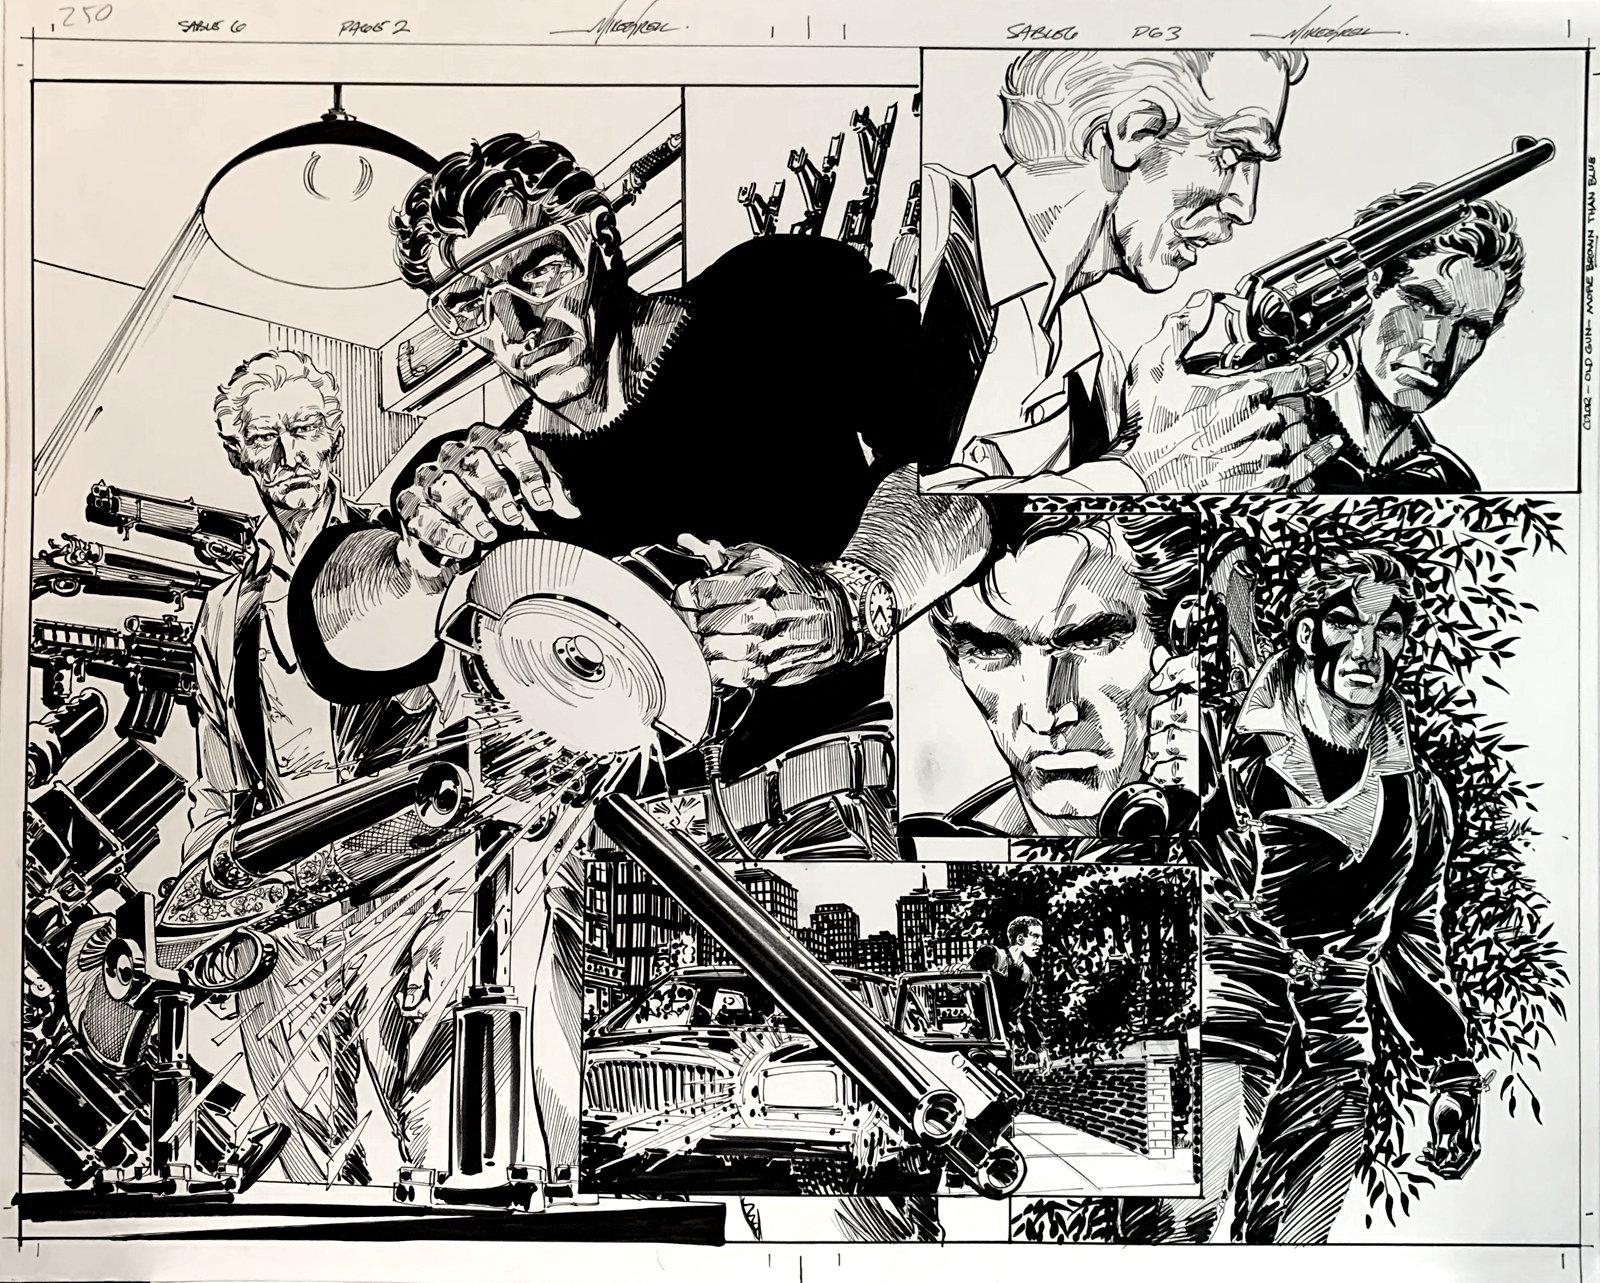 Jon Sable, Freelance: Bloodtrail #6 p 2-3 Huge Double Page Spread SPLASH On 1 Large Board! (2005)